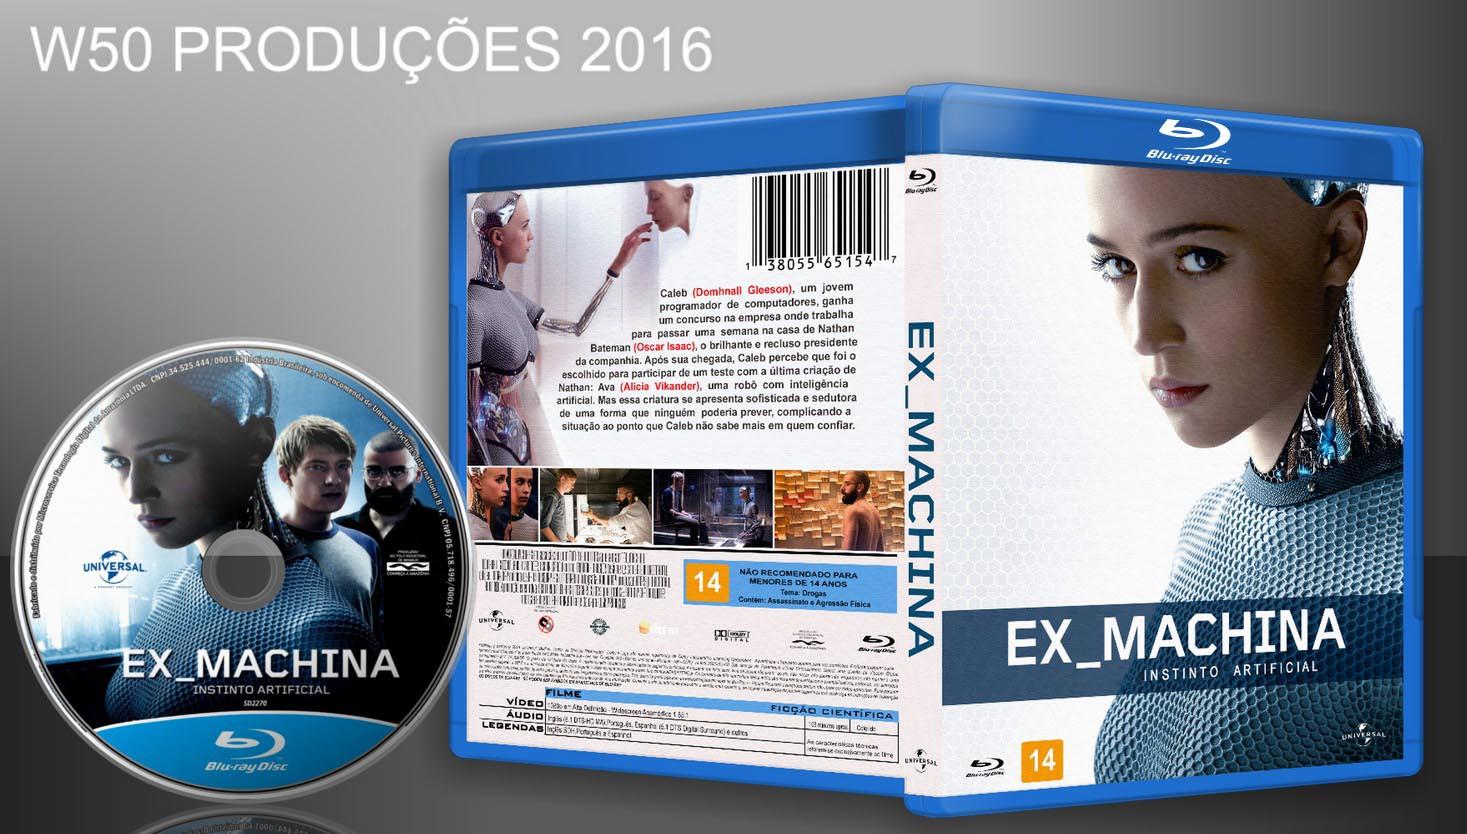 w50 produ es cds dvds blu ray ex machina blu ray lan amento 2016. Black Bedroom Furniture Sets. Home Design Ideas